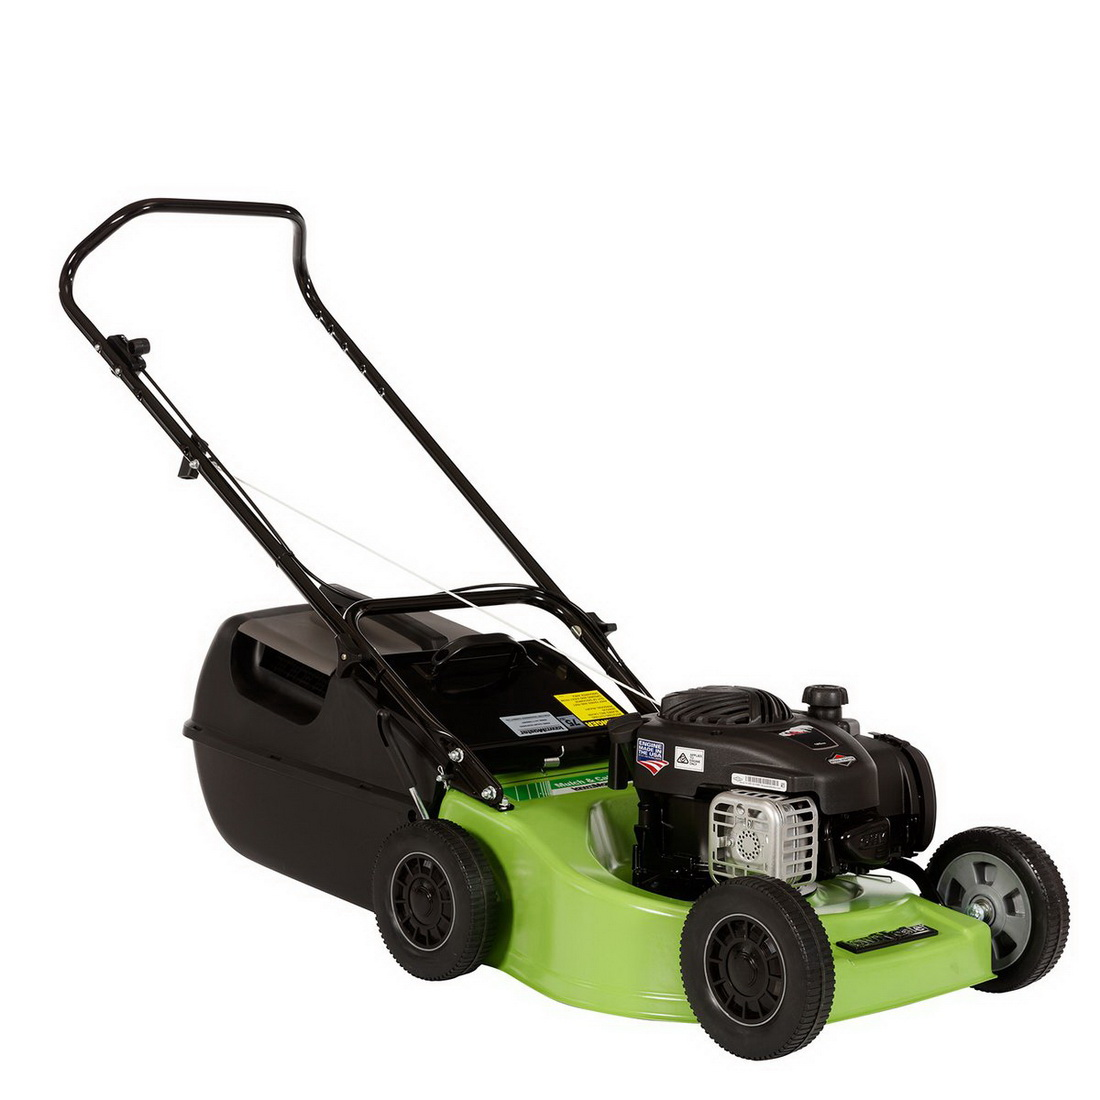 450E Petrol Rotary Lawn Mower 125CC 480mm Cut Width LSPA1922P4450U